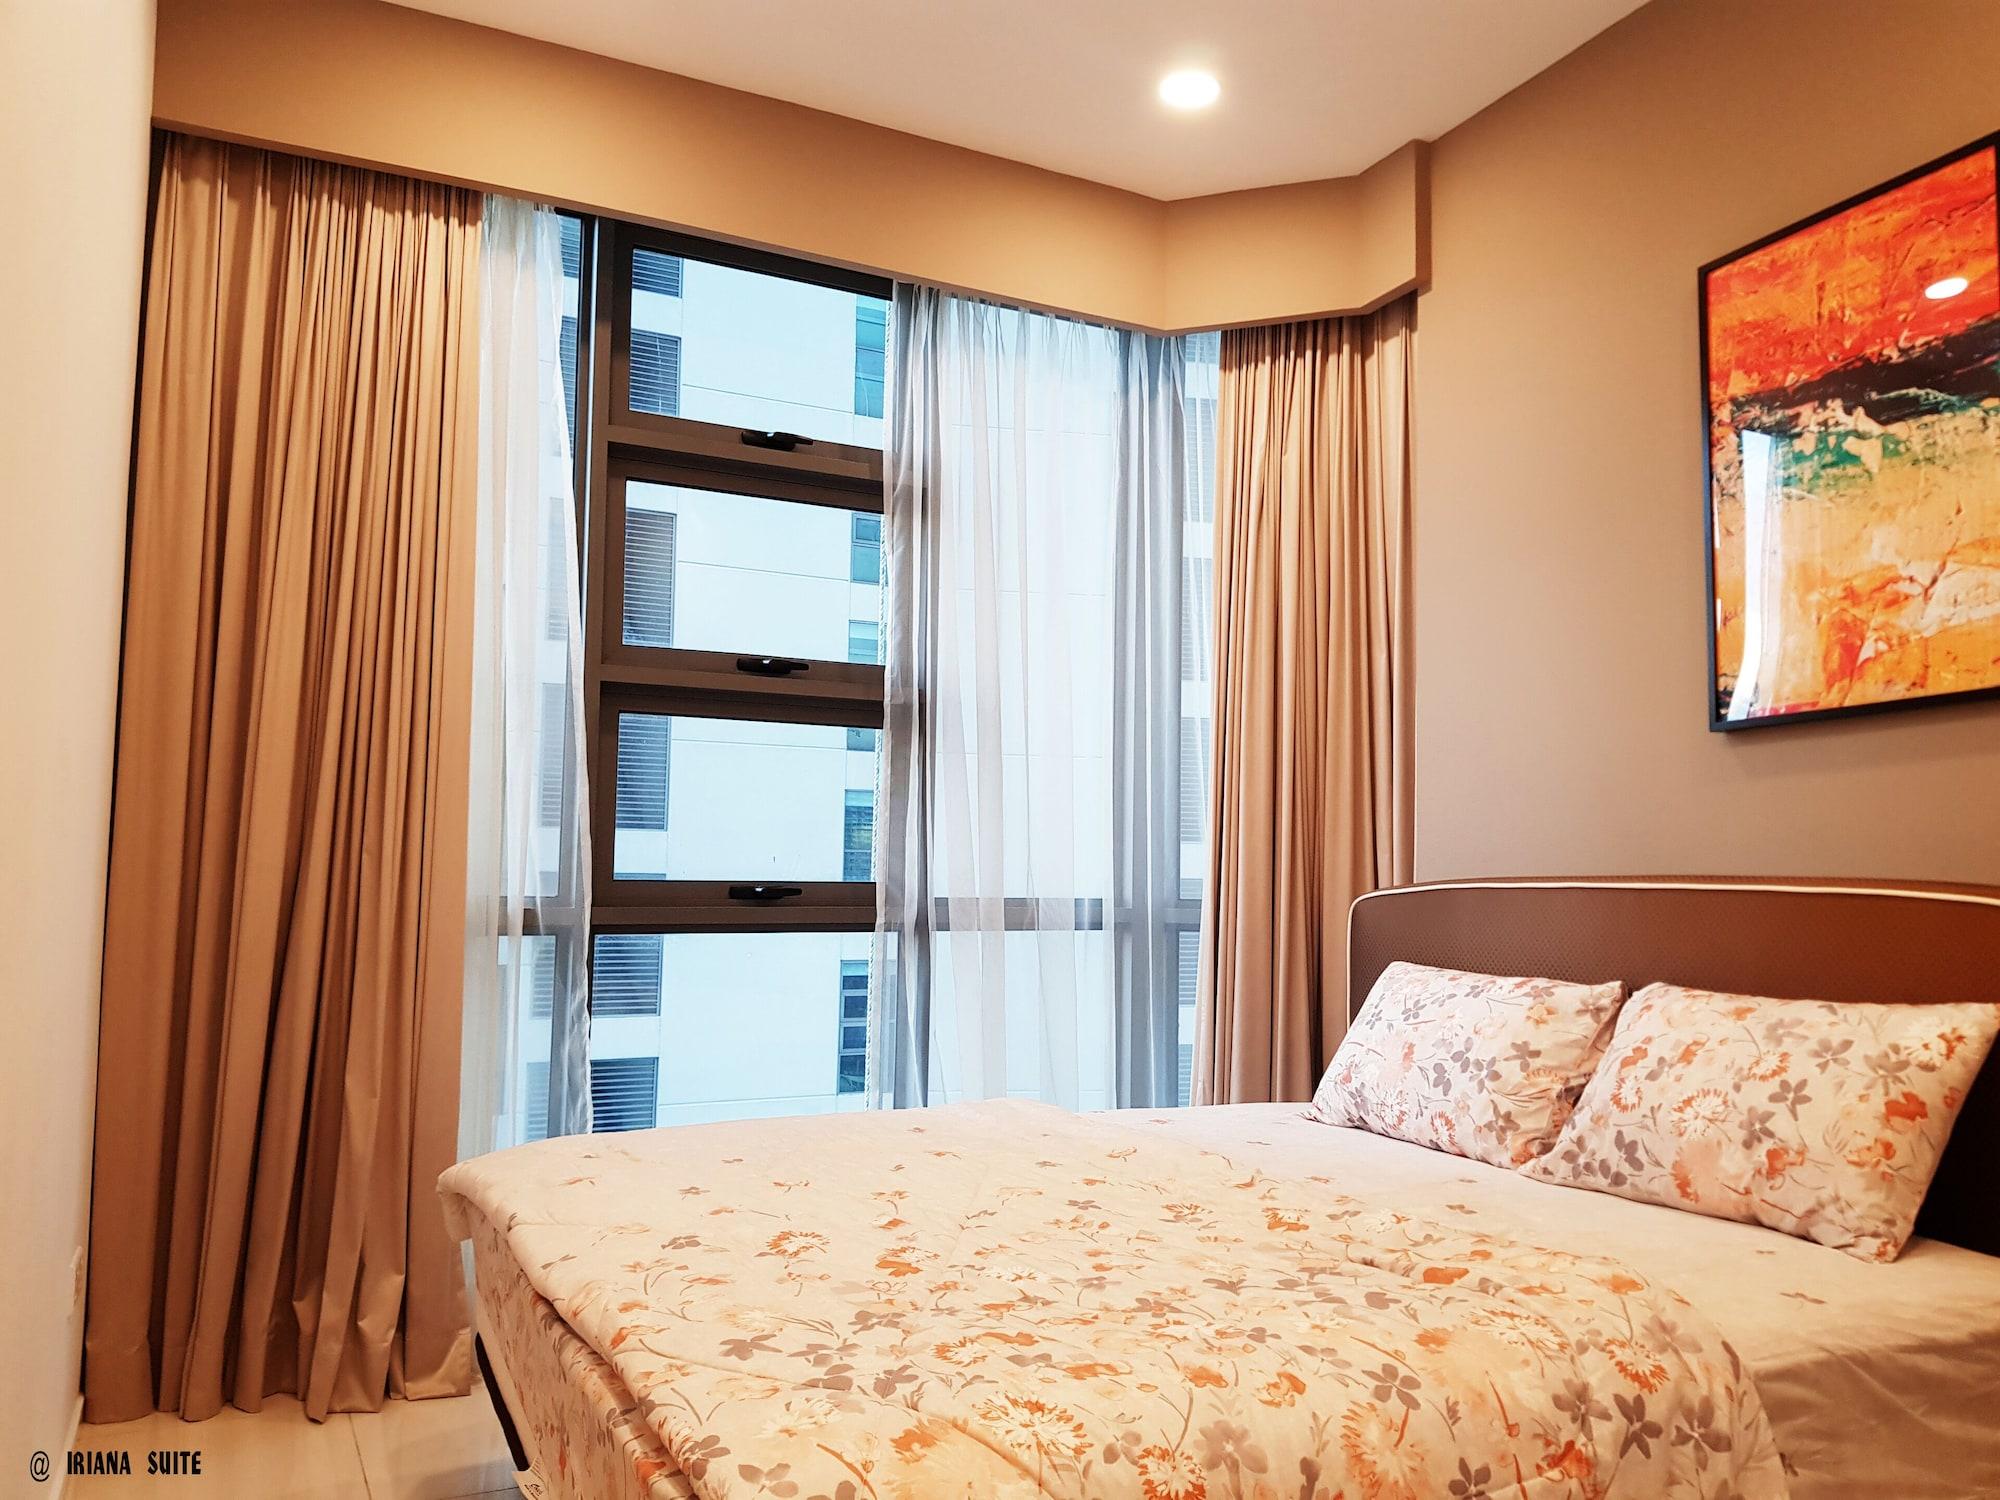 Robertson Residence By Iriana Suites, Kuala Lumpur